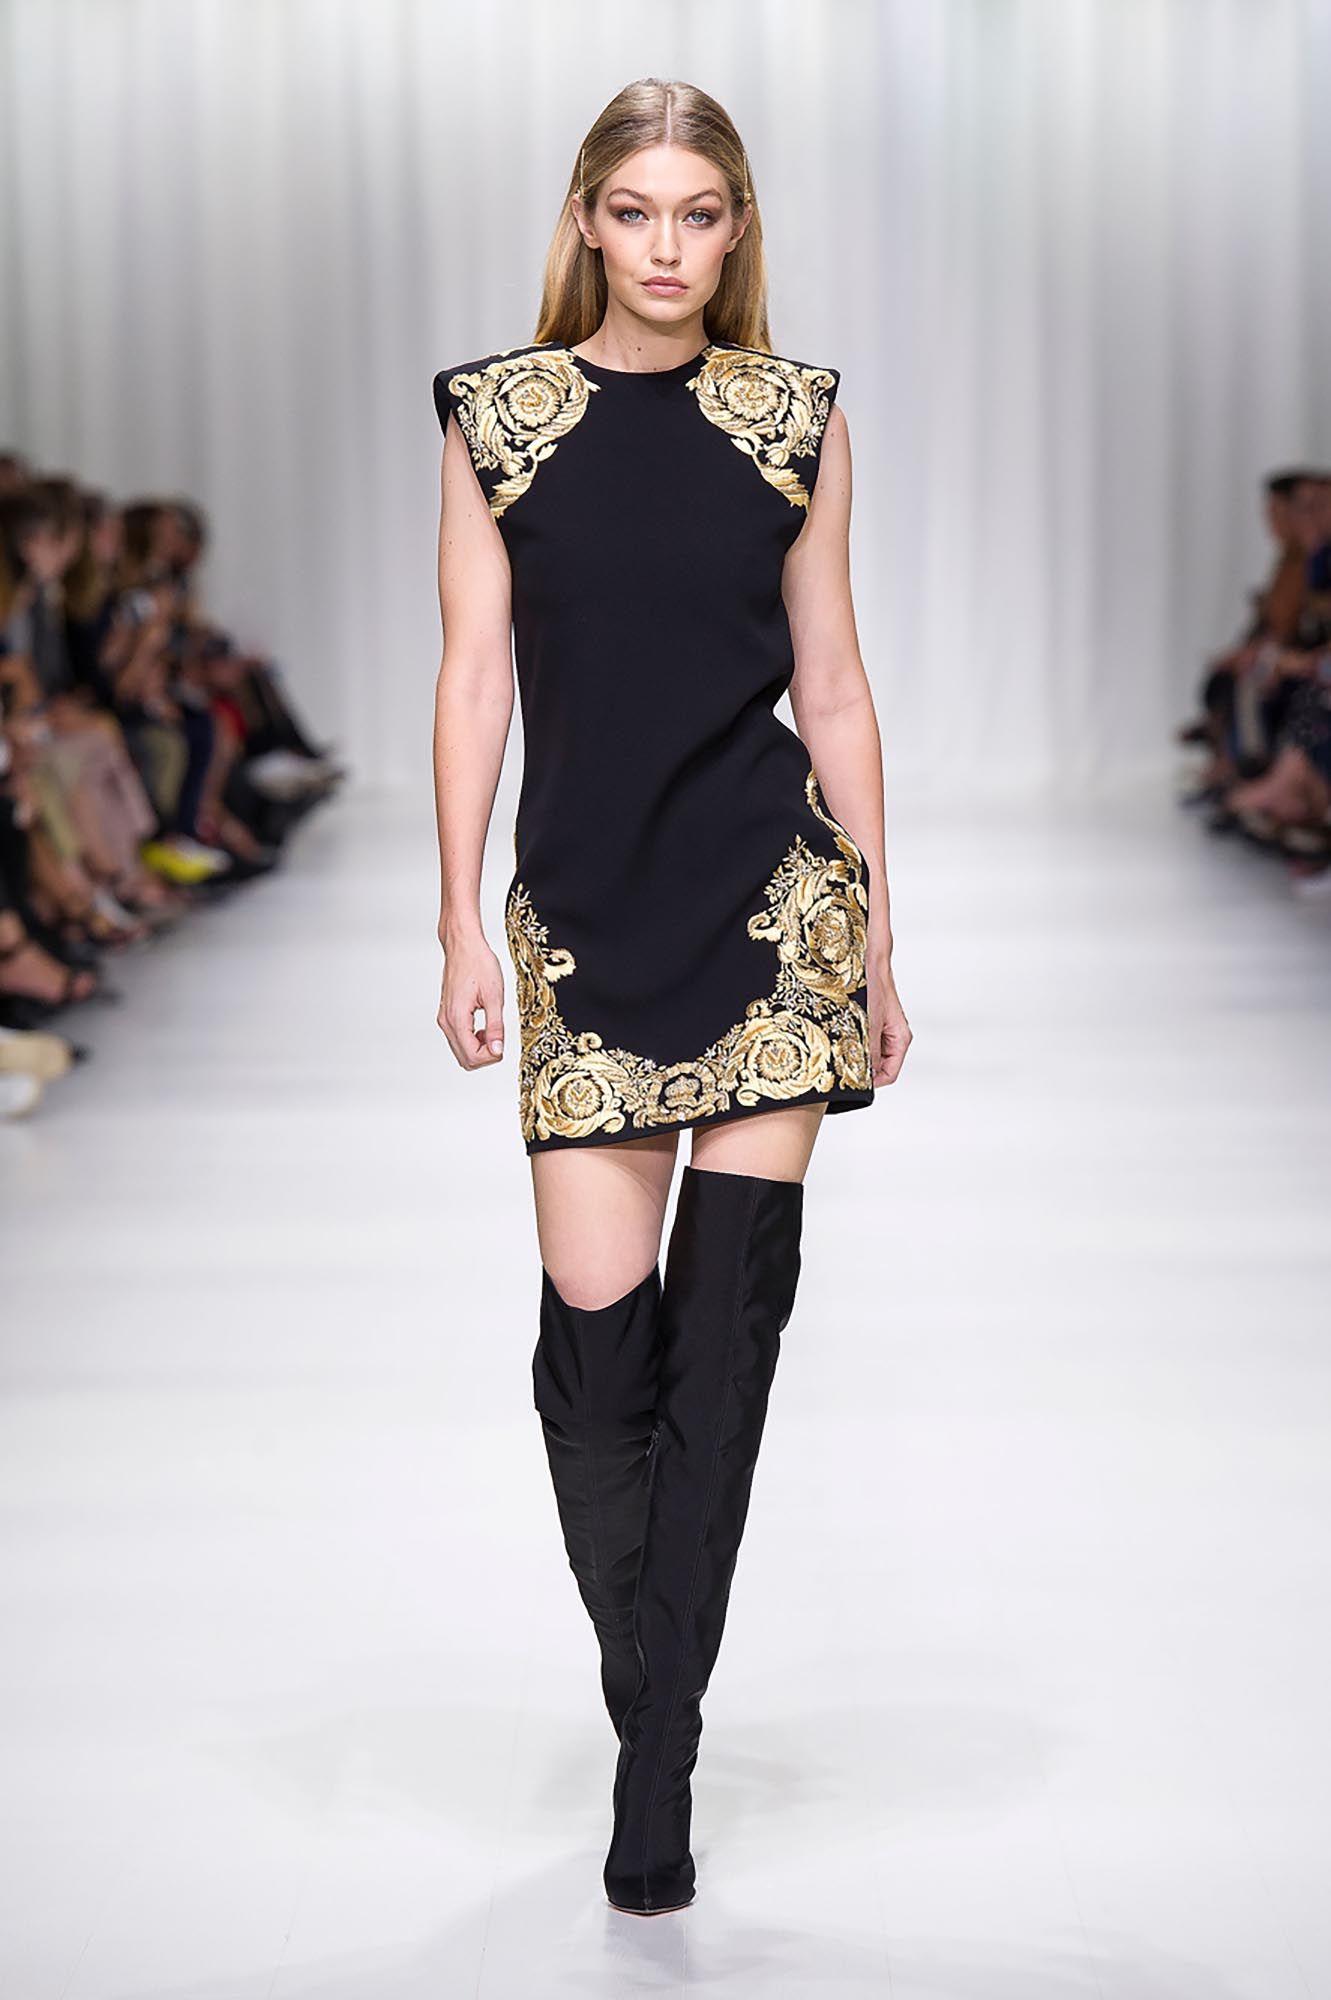 Ladies Versace springsummer runway collection forecast dress in spring in 2019